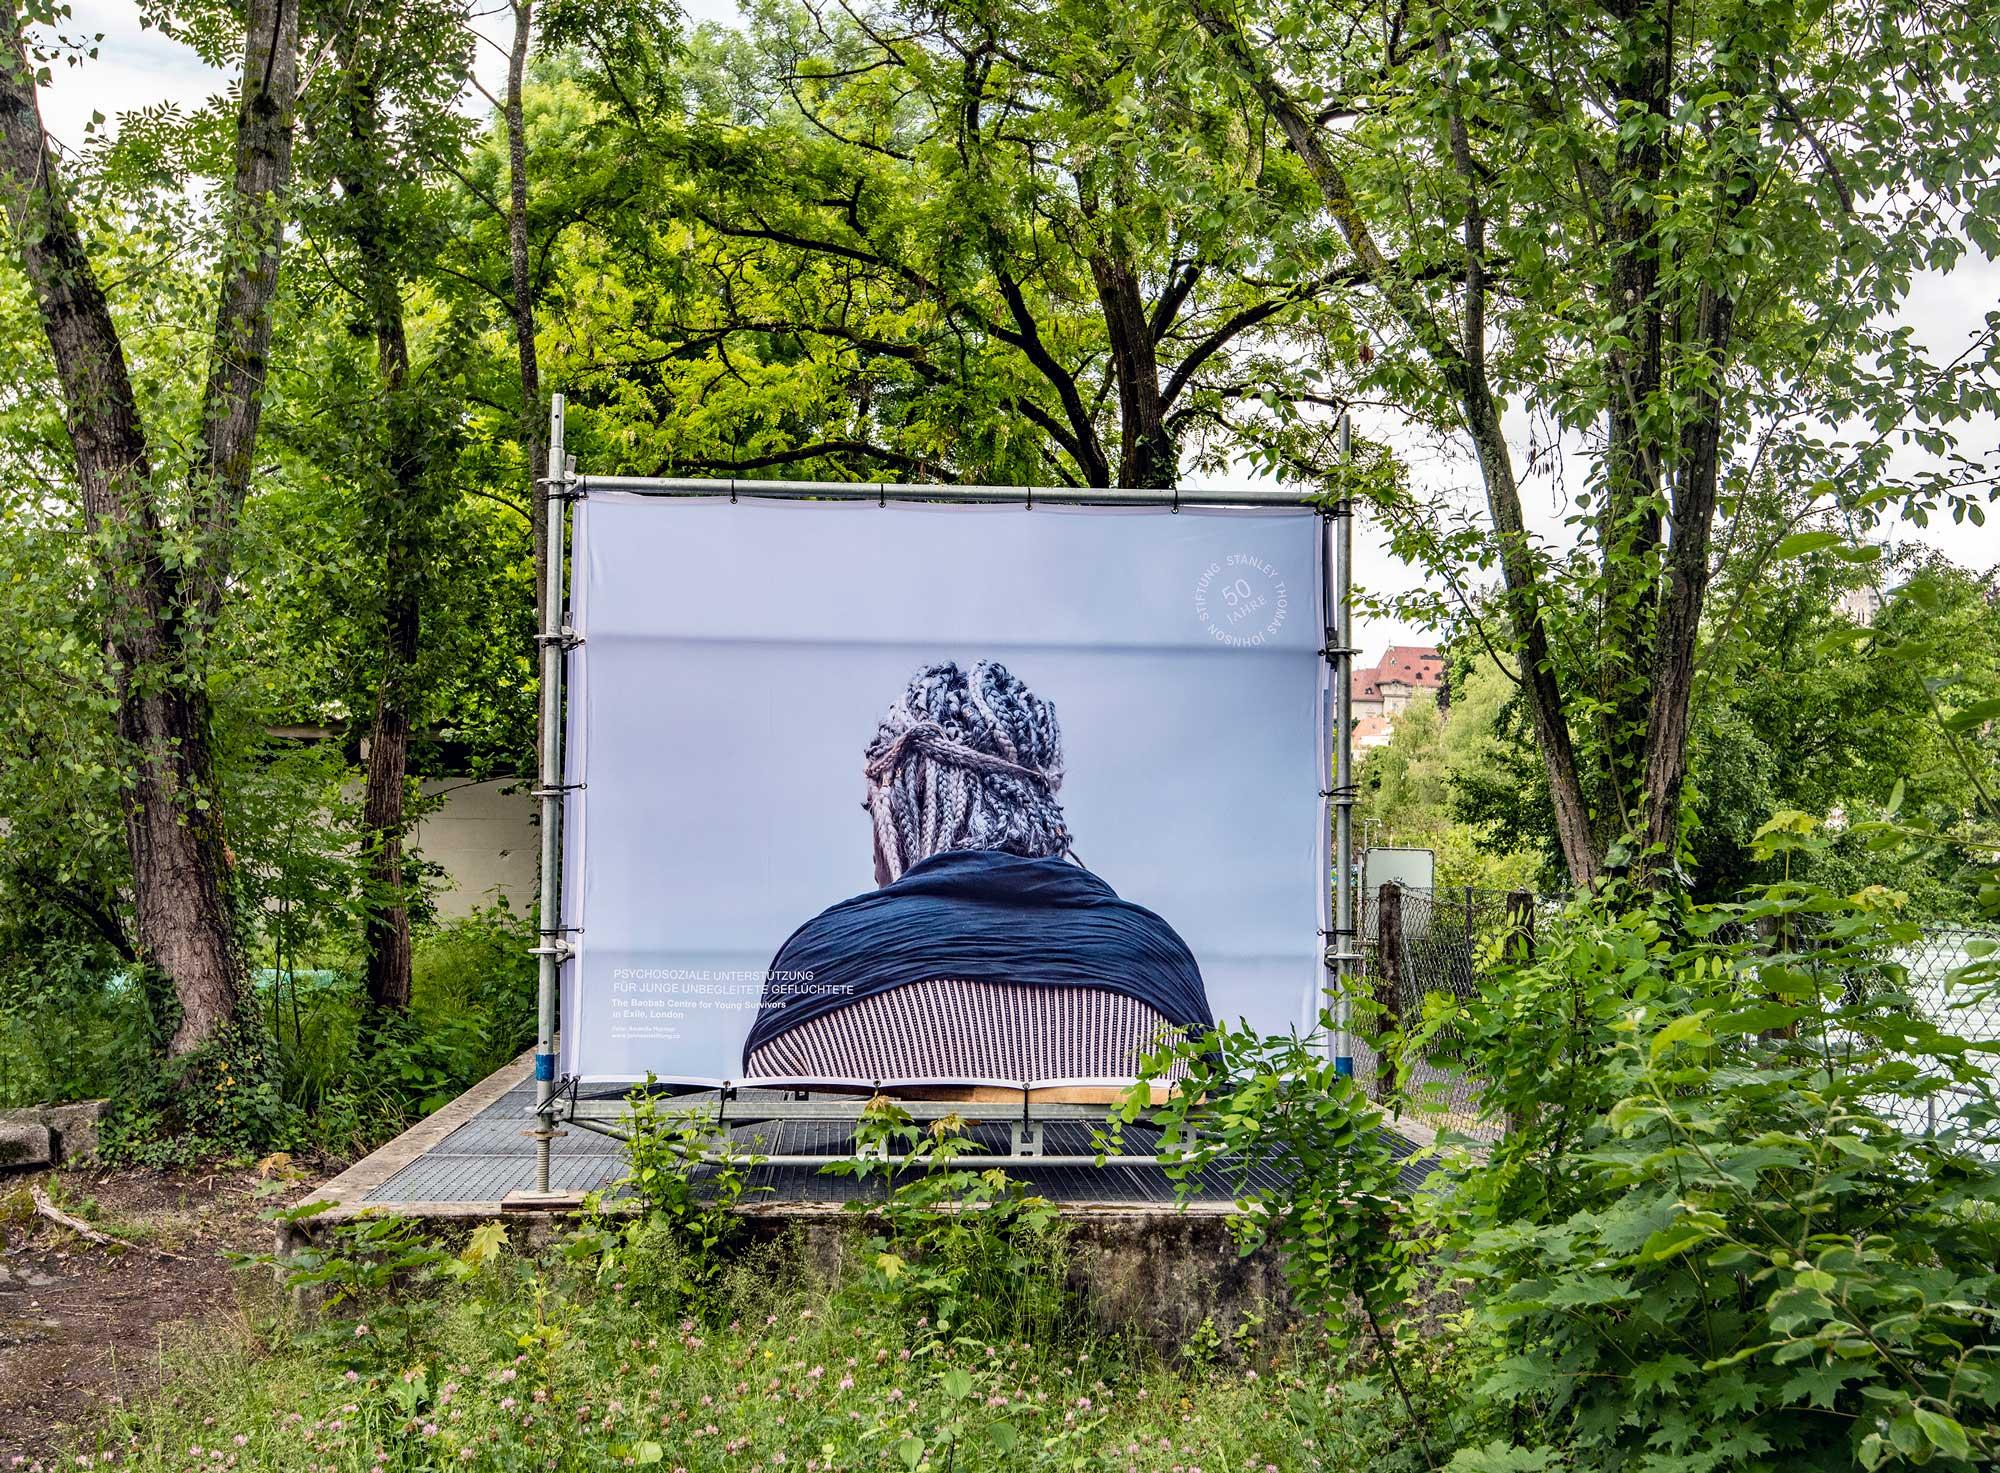 Atelier Pol, Stanley Thomas Johnson Stiftung, publication, editorial design, poster exhibition, Bern, switzerland